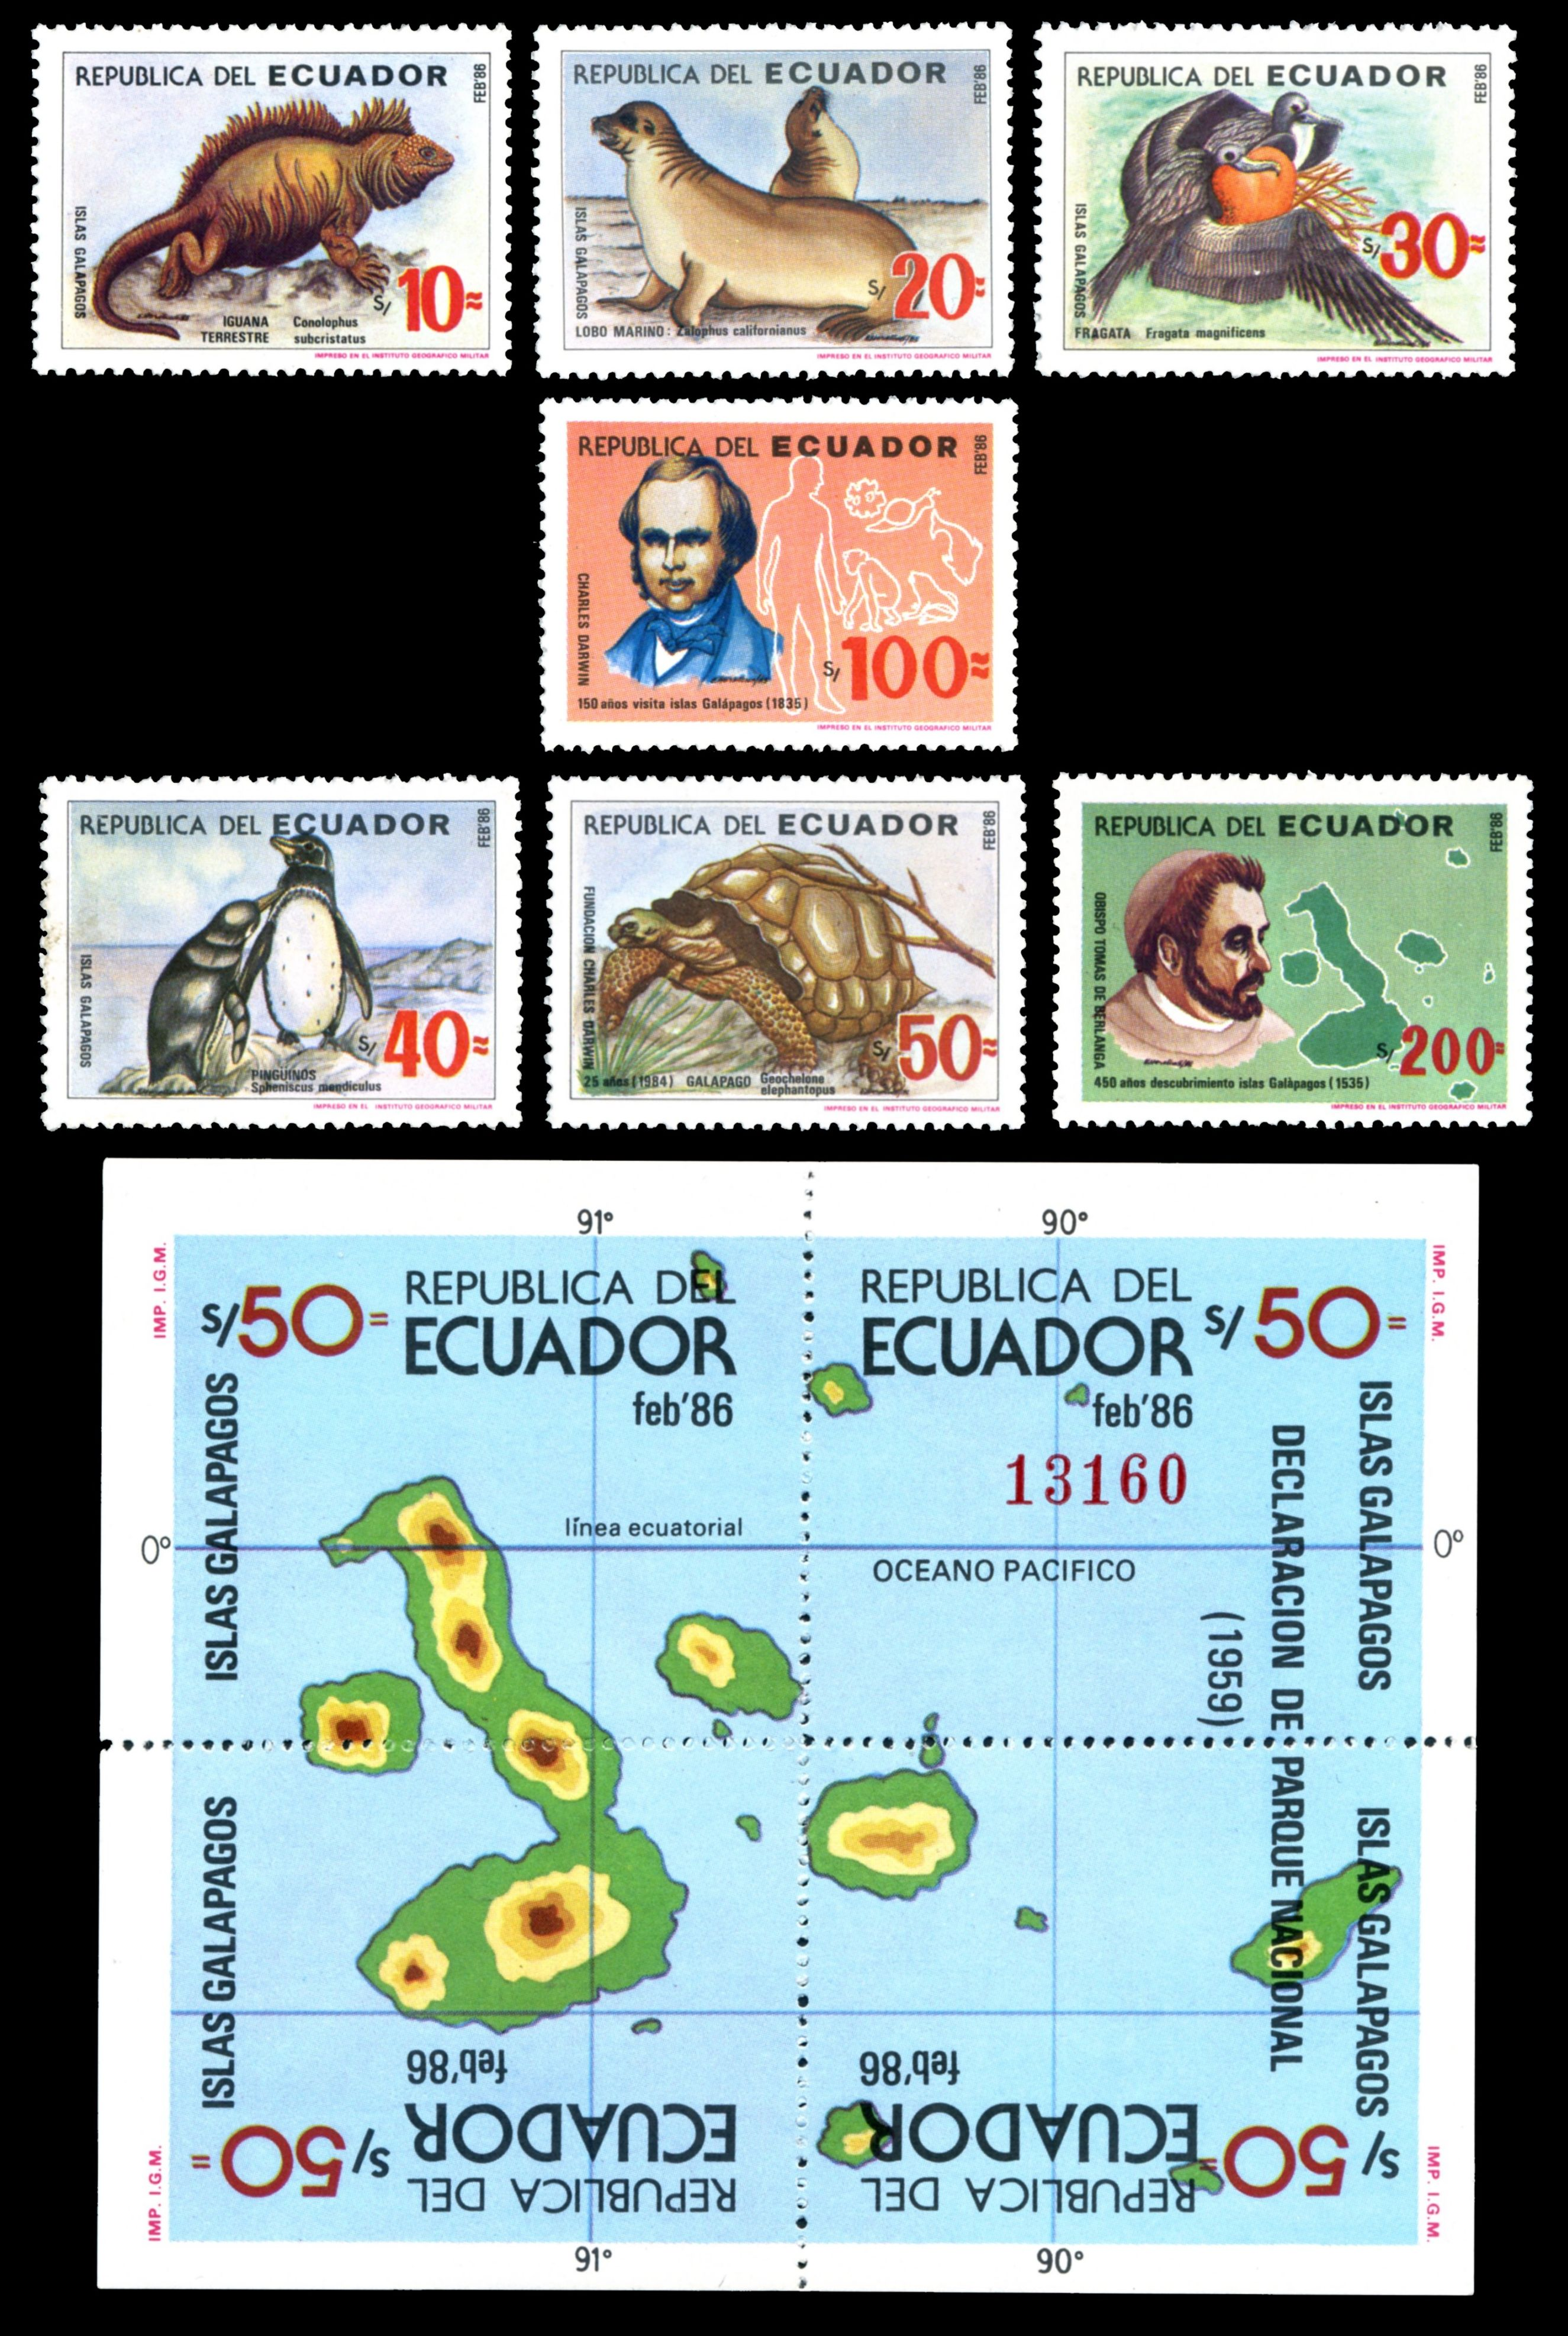 http://www.paleophilatelie.eu/images/sets/ecuador_1986_darwin.jpg